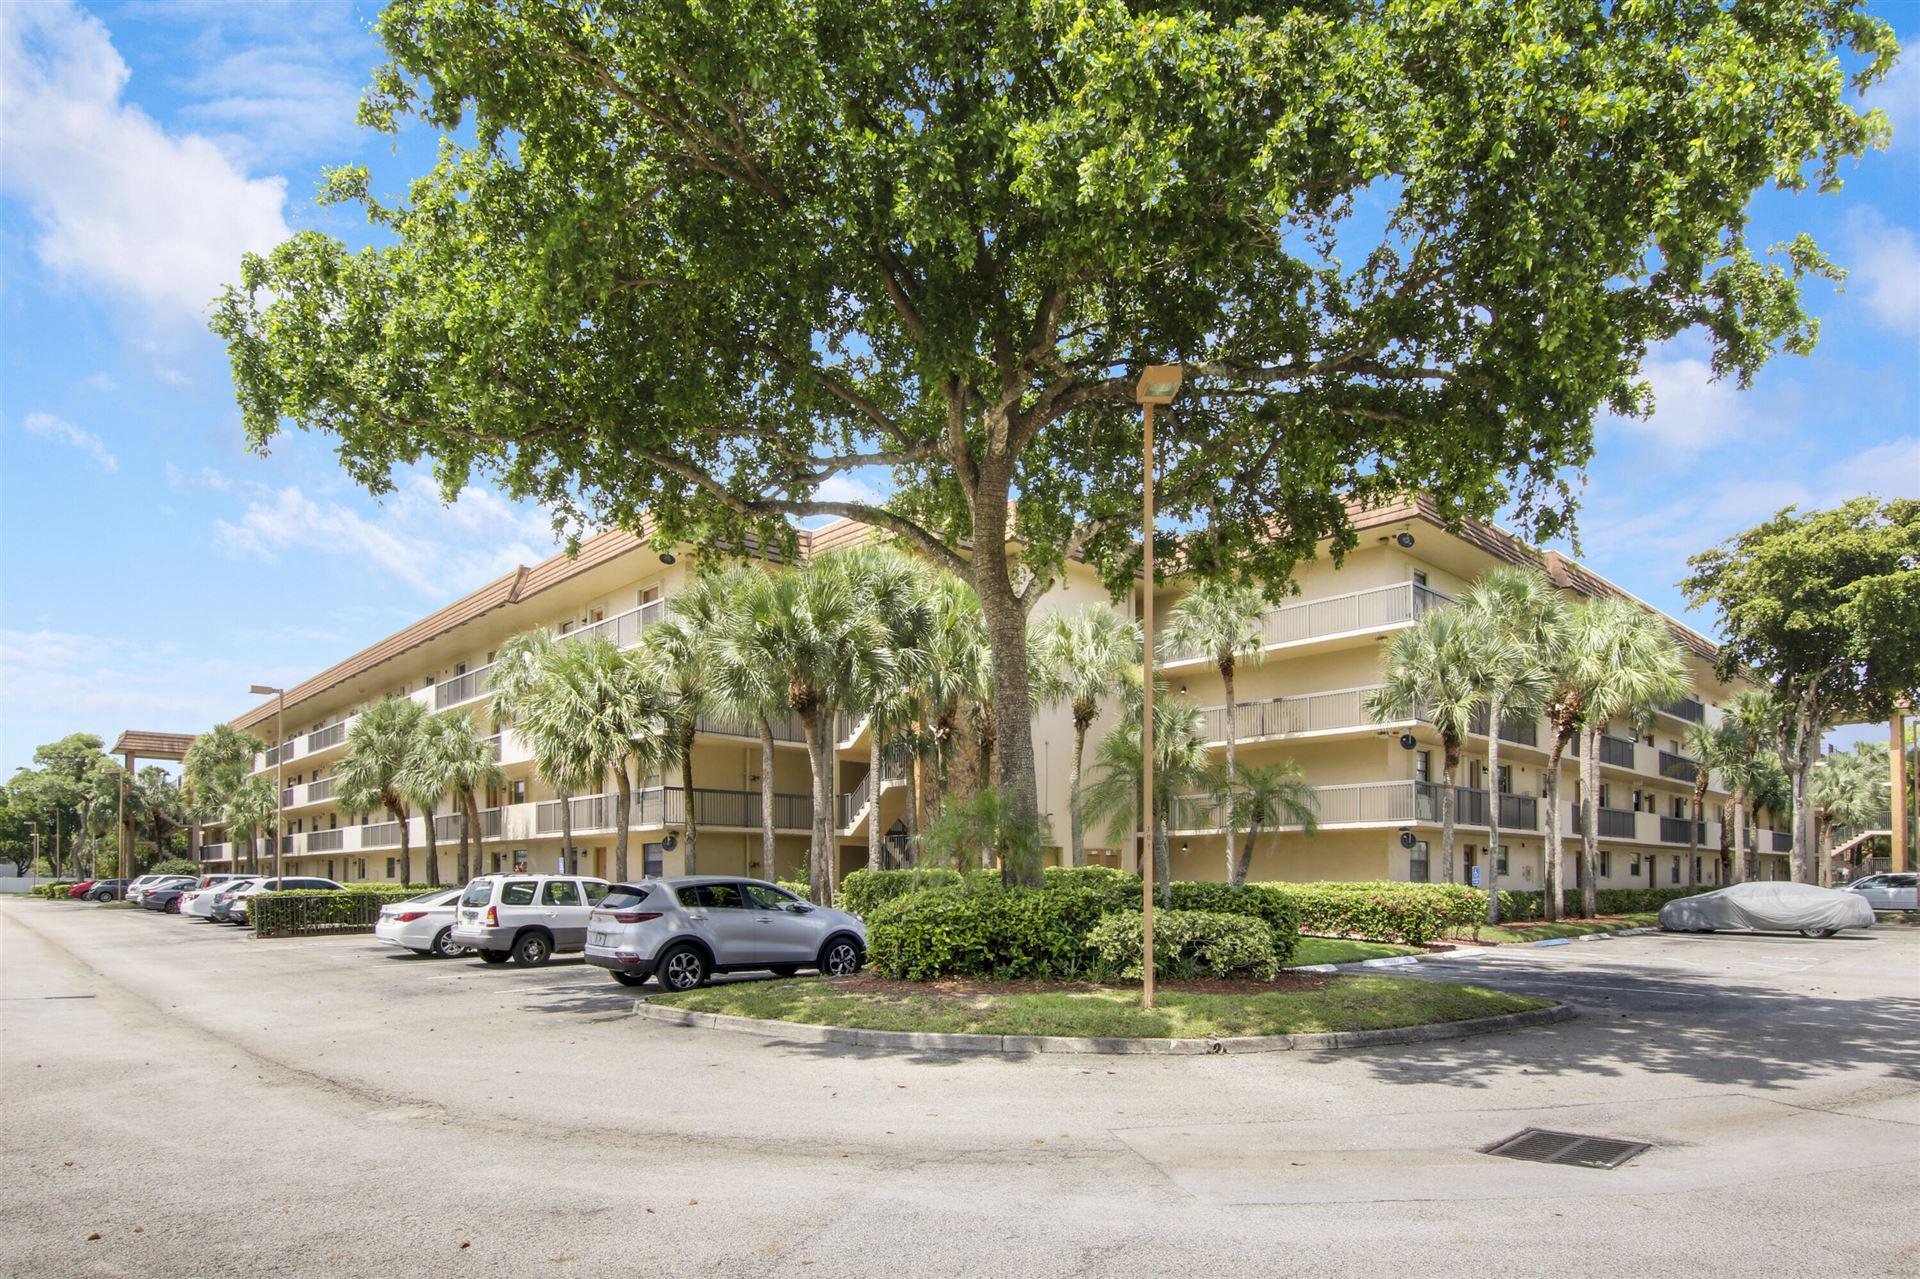 Photo of 4930 E Sabal Palm Boulevard #303, Tamarac, FL 33319 (MLS # RX-10733795)